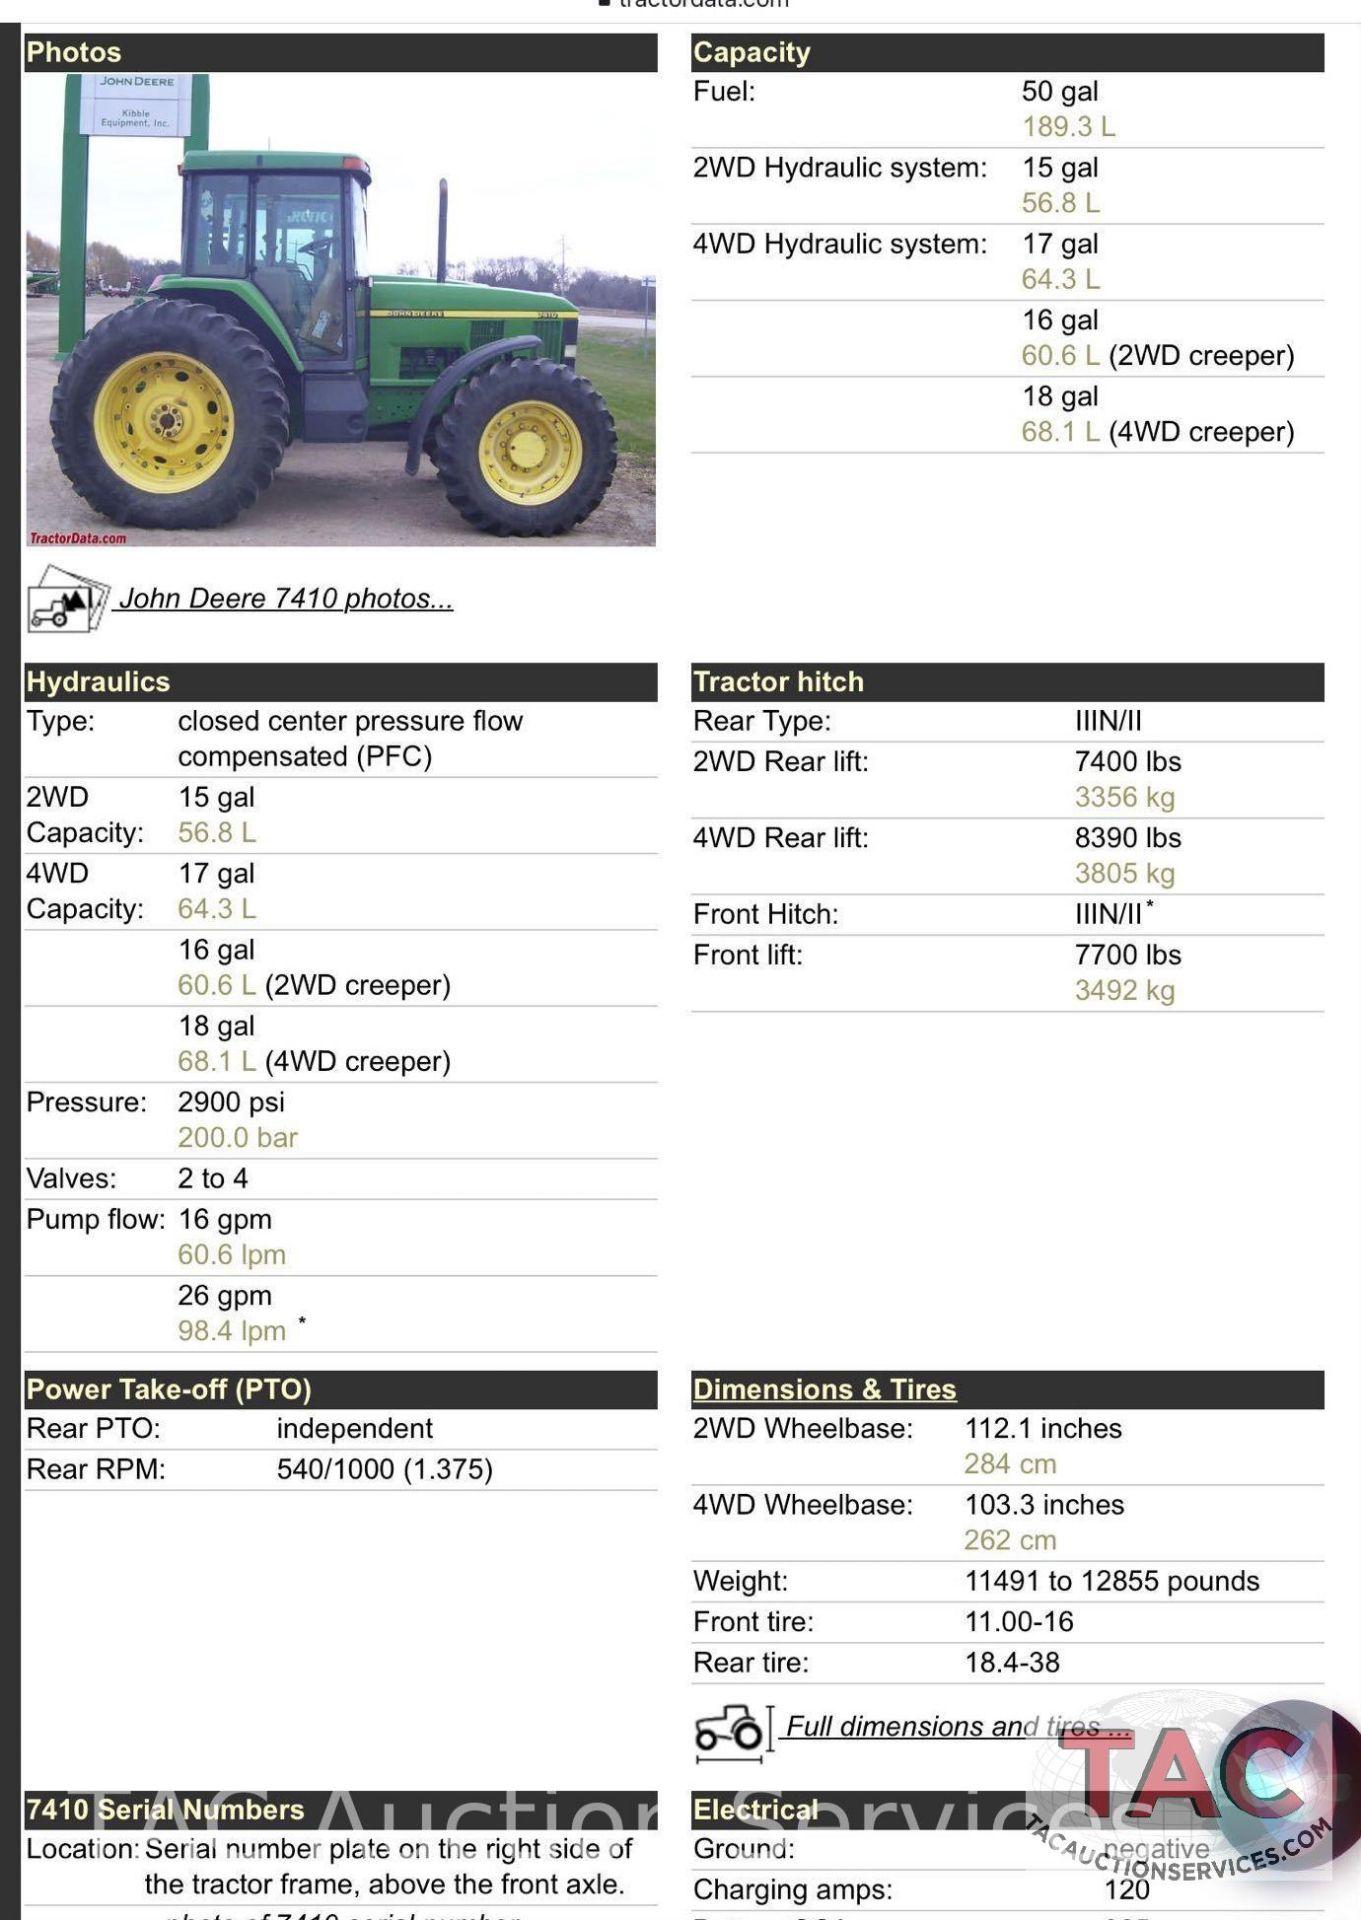 John Deere 7410 Farm Tractor - Image 23 of 24